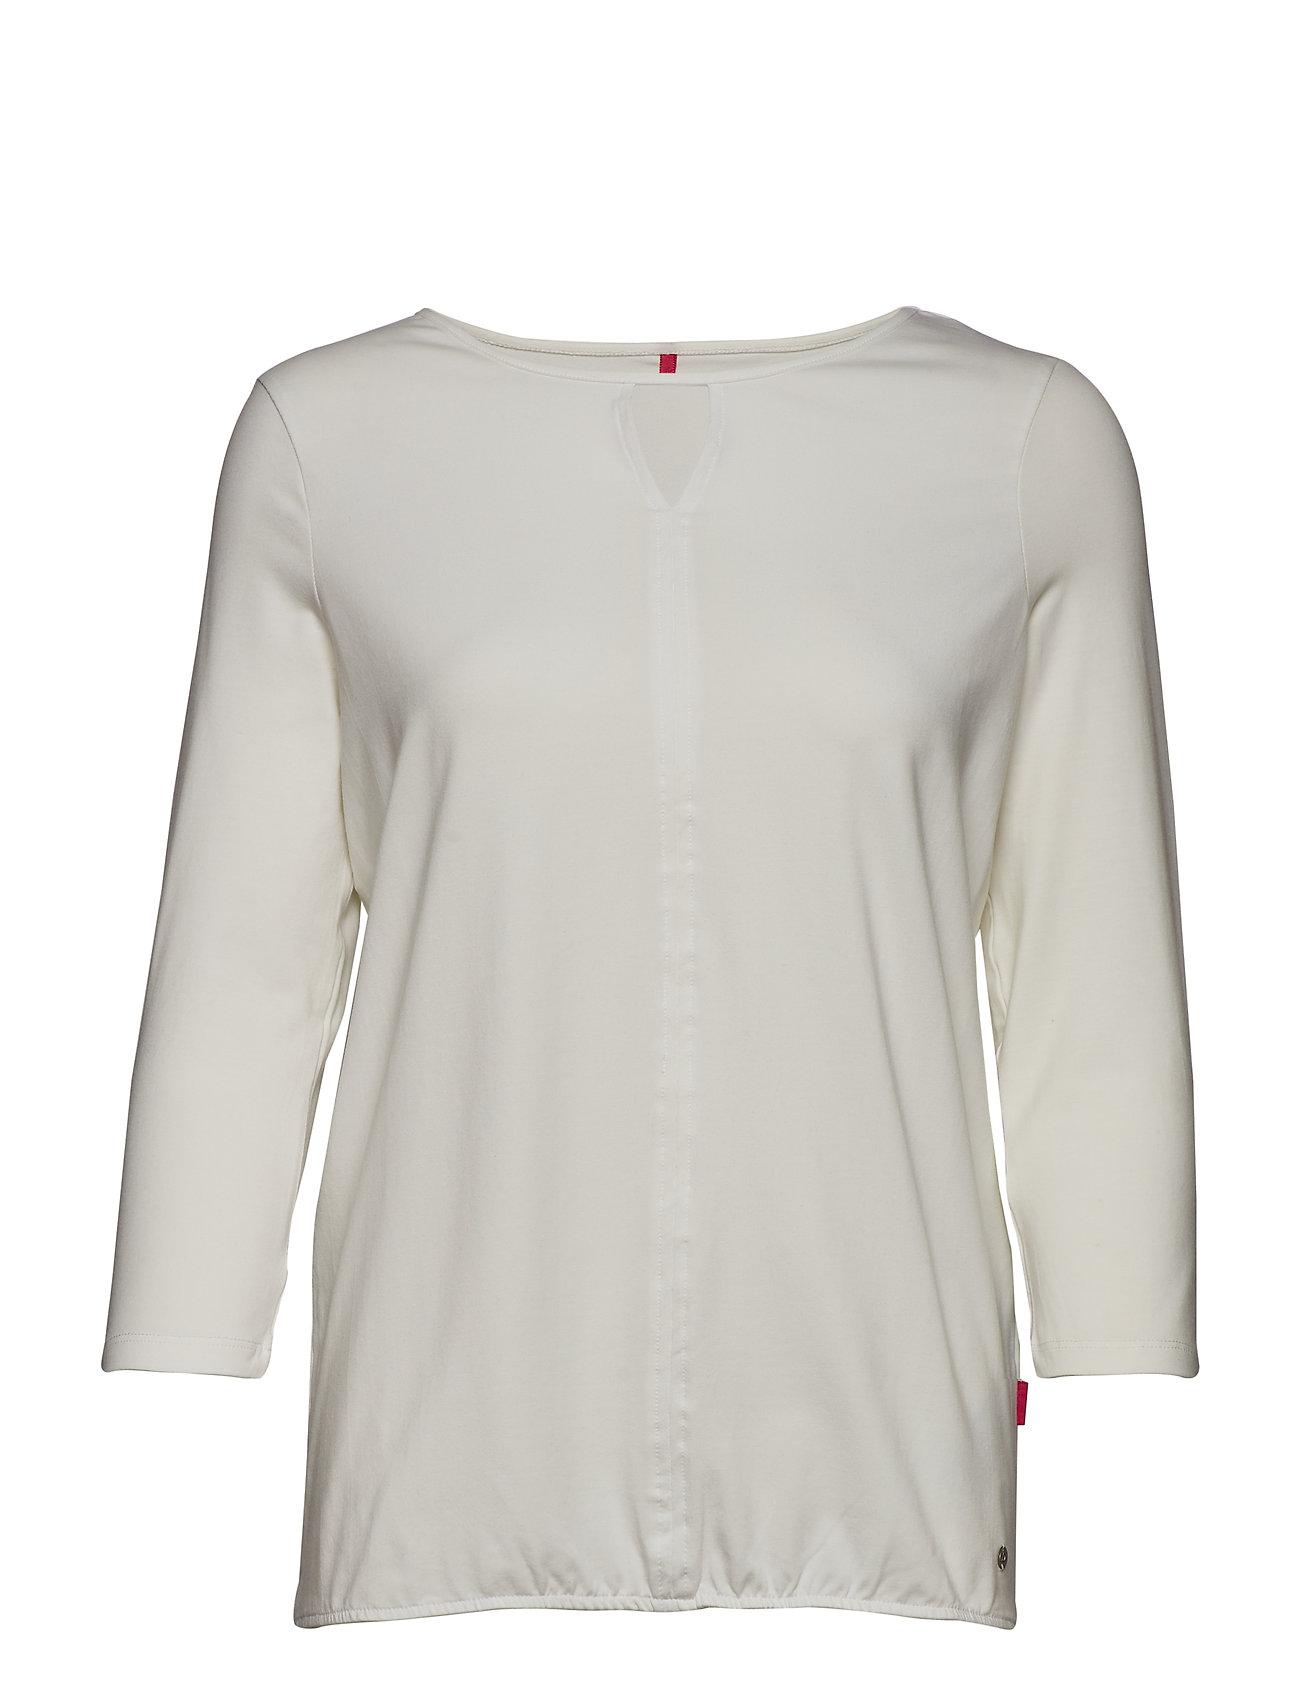 Image of T-Shirt 3/4-Sleeve R Langærmet T-shirt Creme GERRY WEBER EDITION (3091989125)